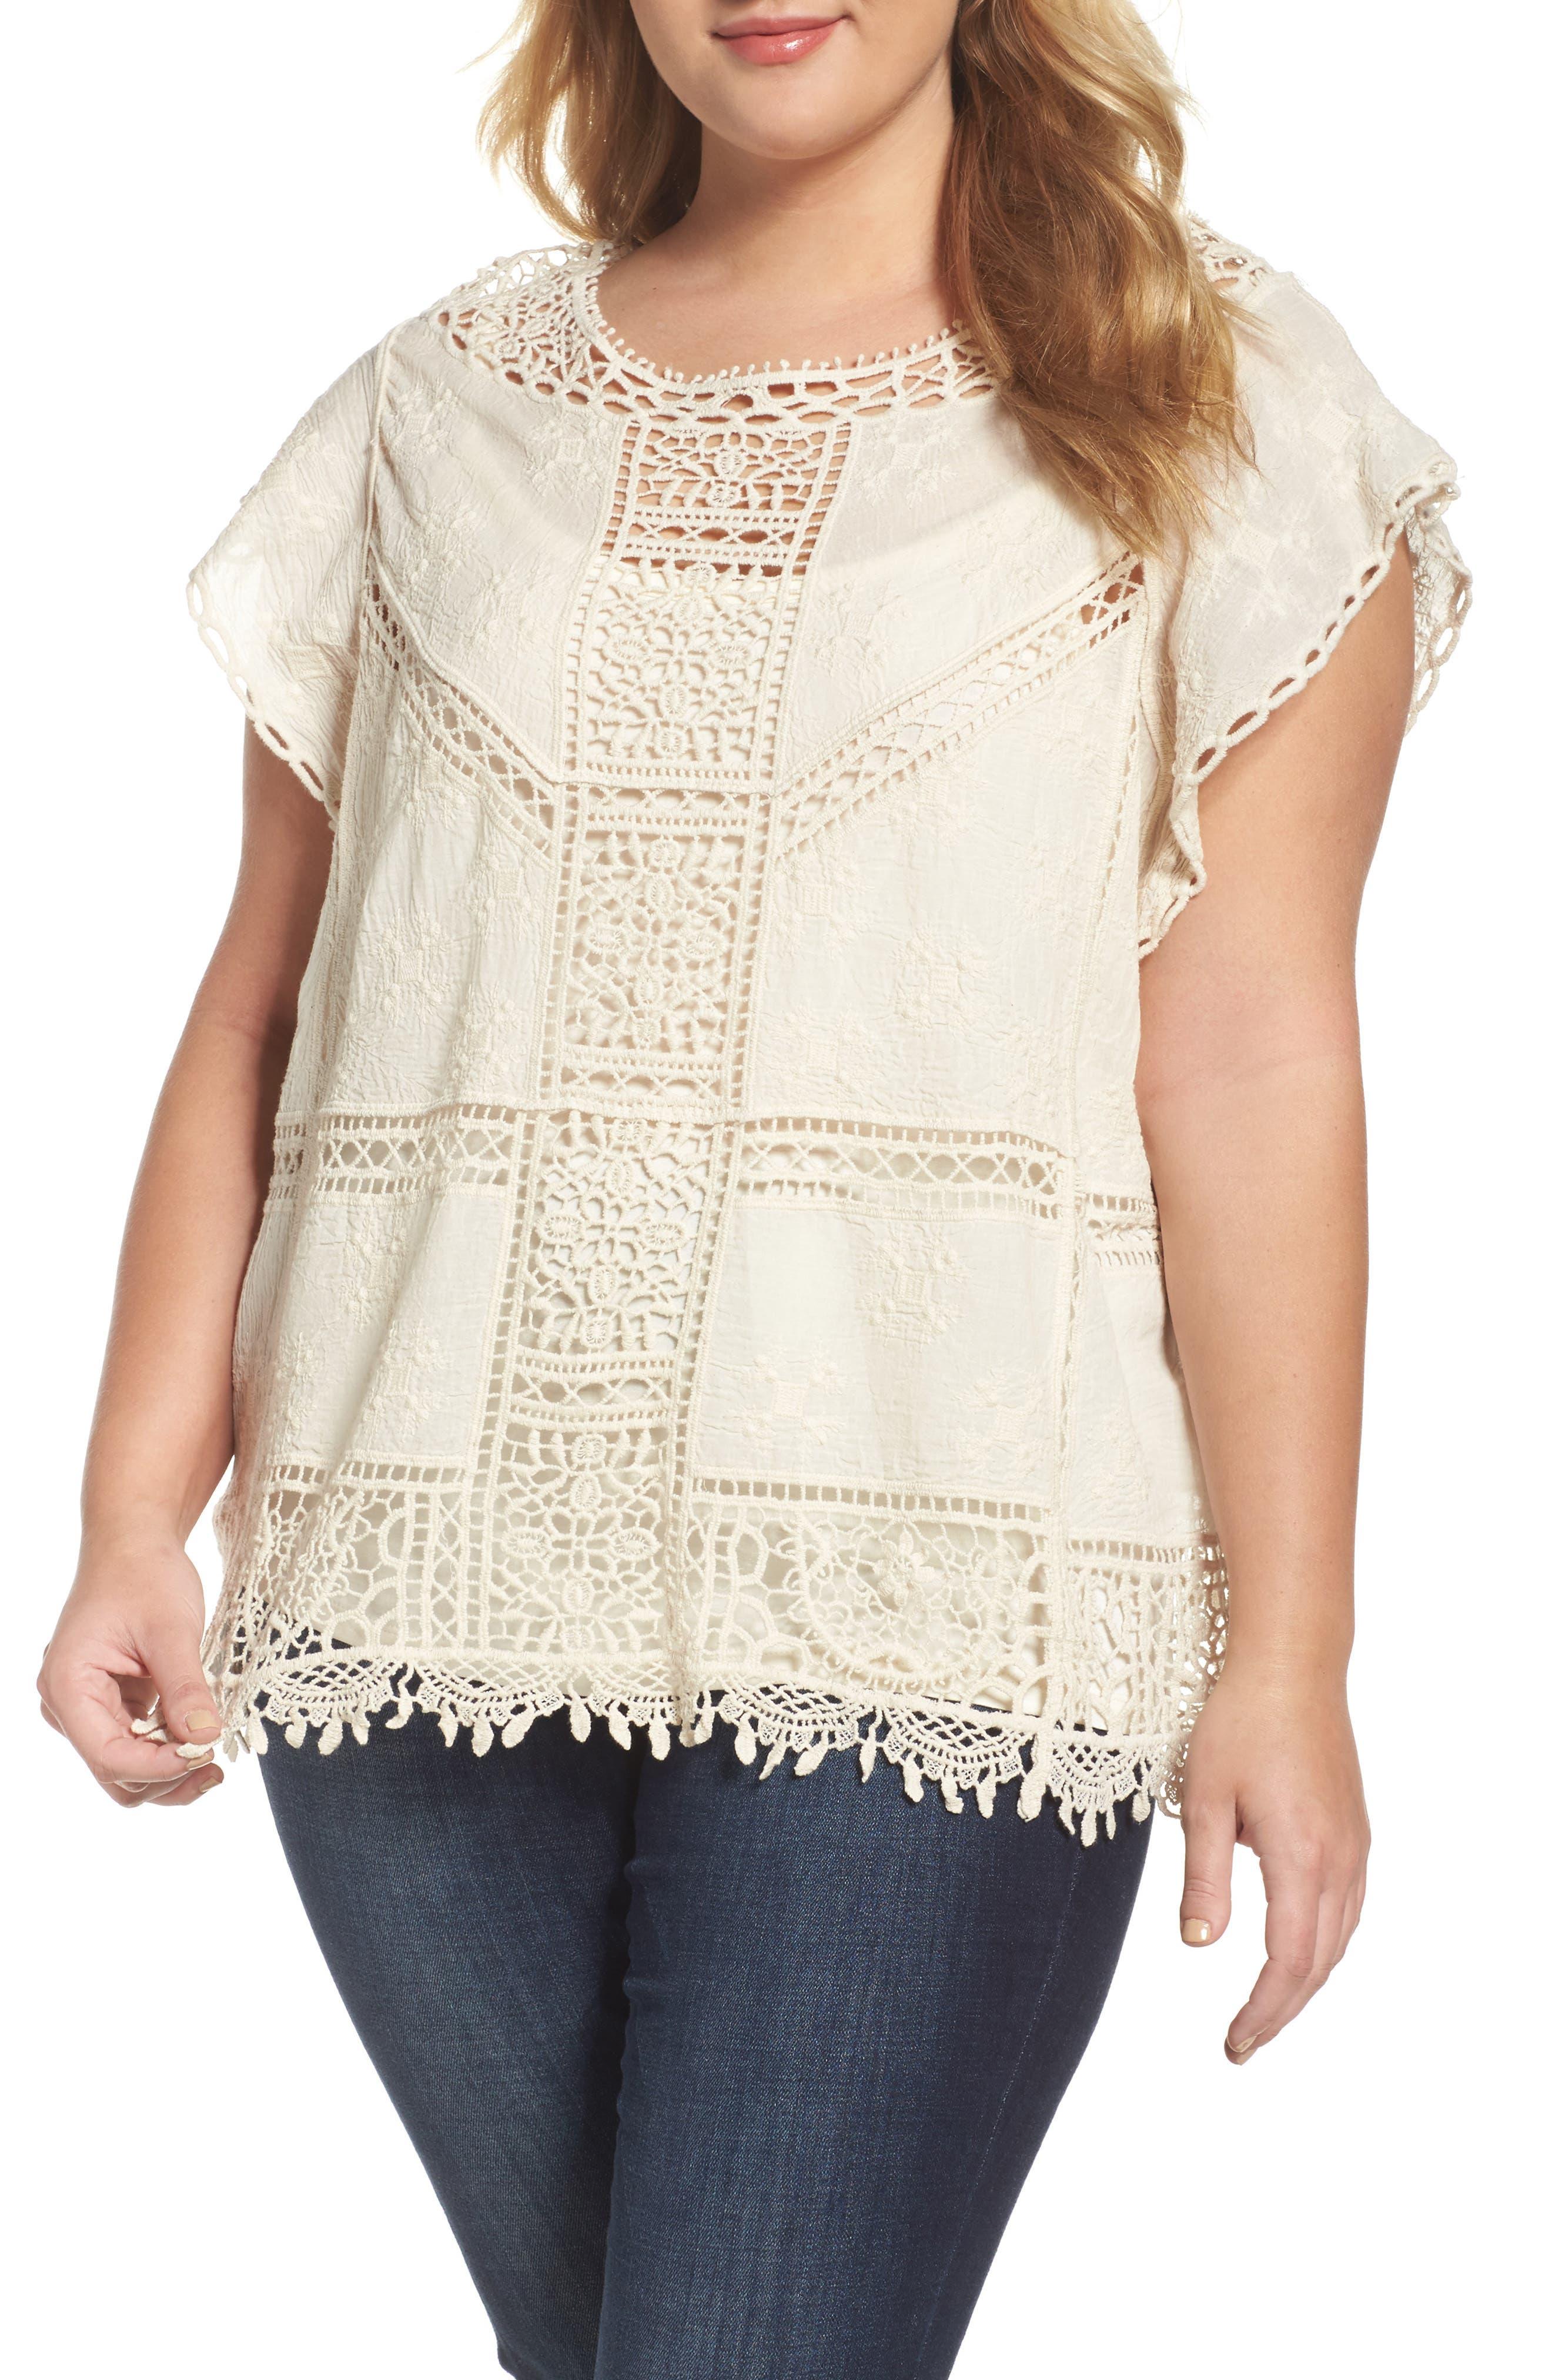 Wit & Wisdom Flutter Sleeve Crochet Top (Plus Size) (Nordstrom Exclusive)